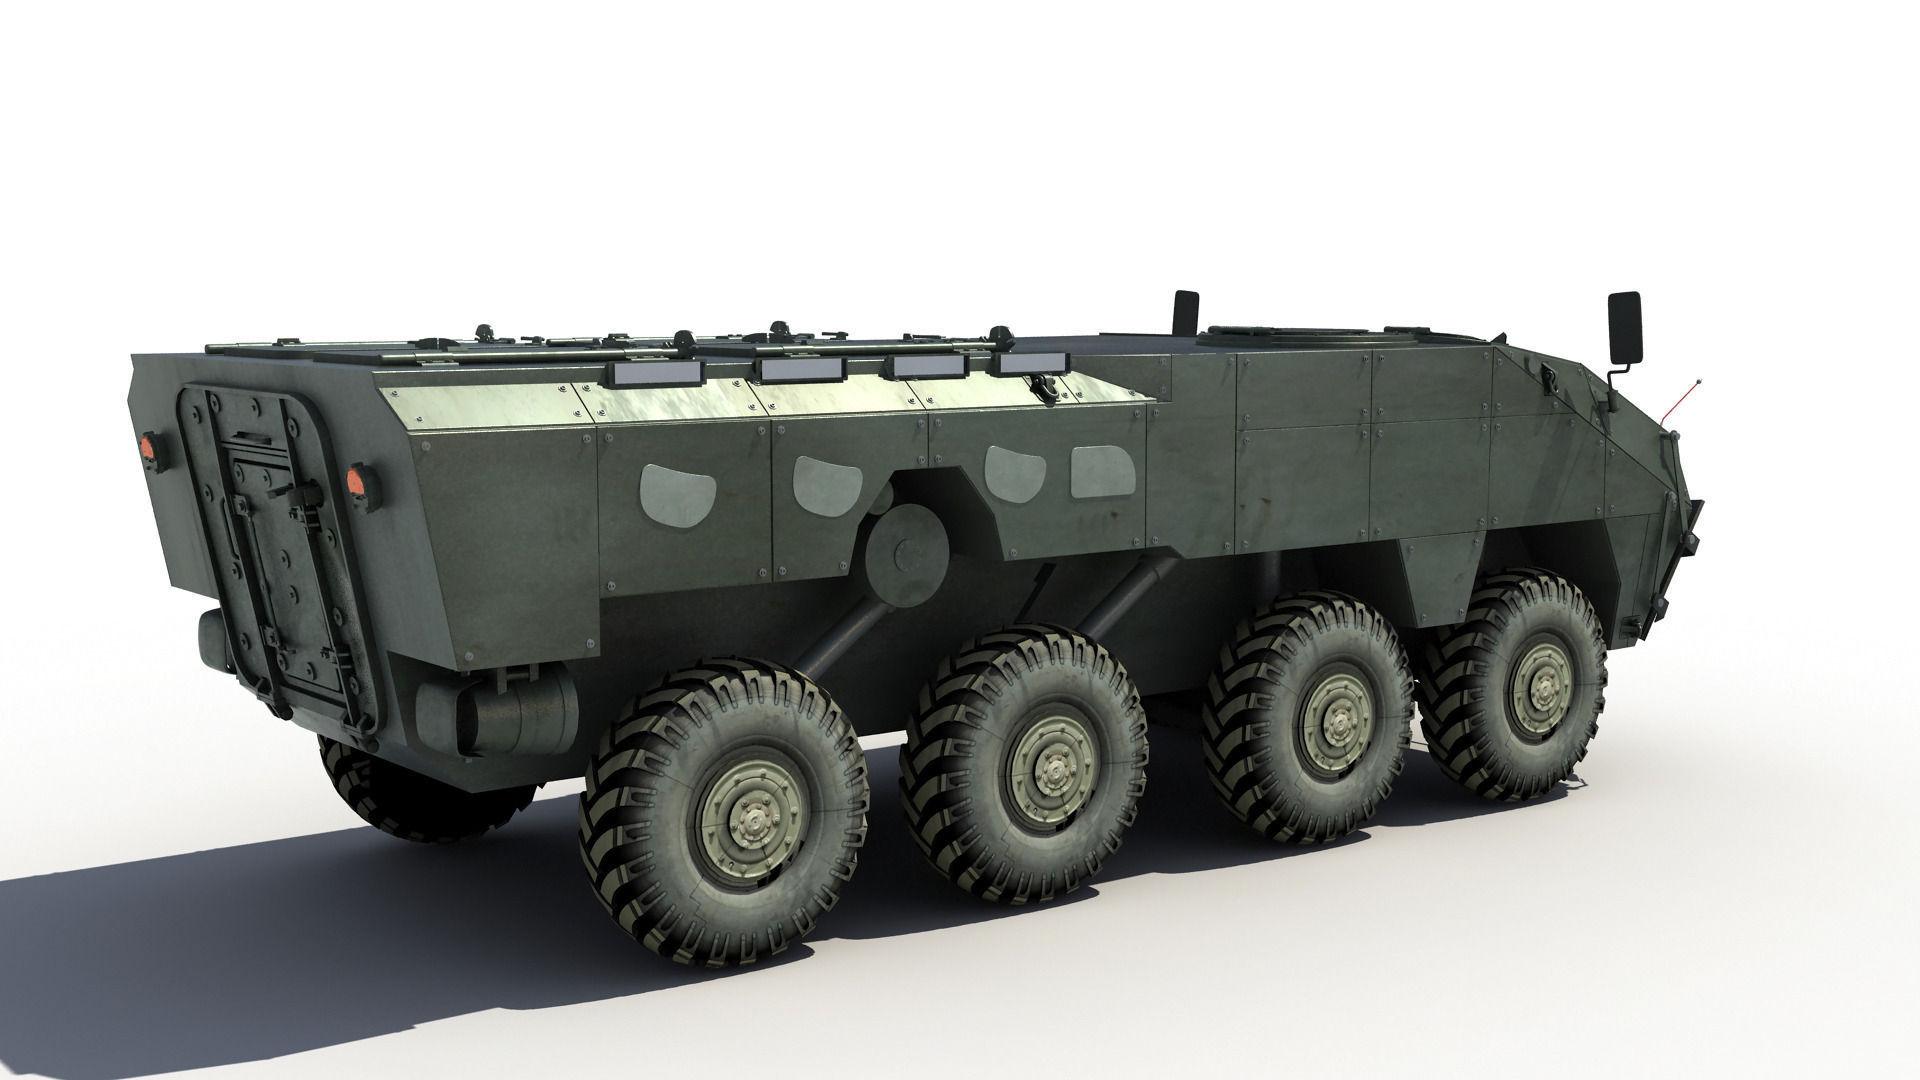 tata-kestrel-apc-3d-model-max (1).jpg